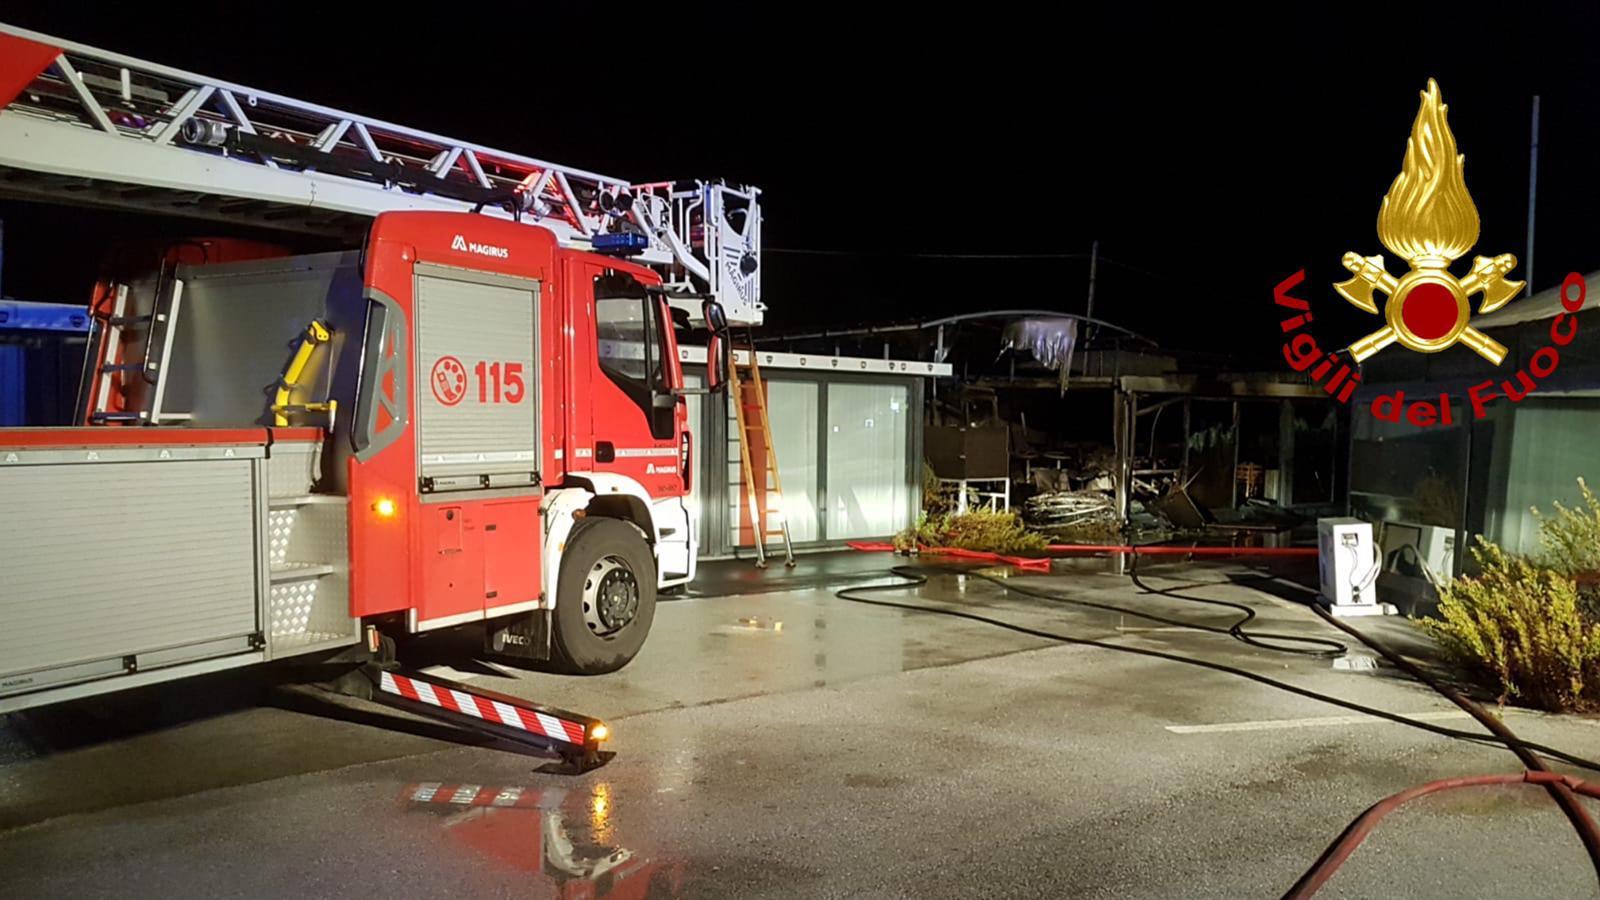 Racket a Siracusa, incendiato deposito di arredi in via Elorina FOTO